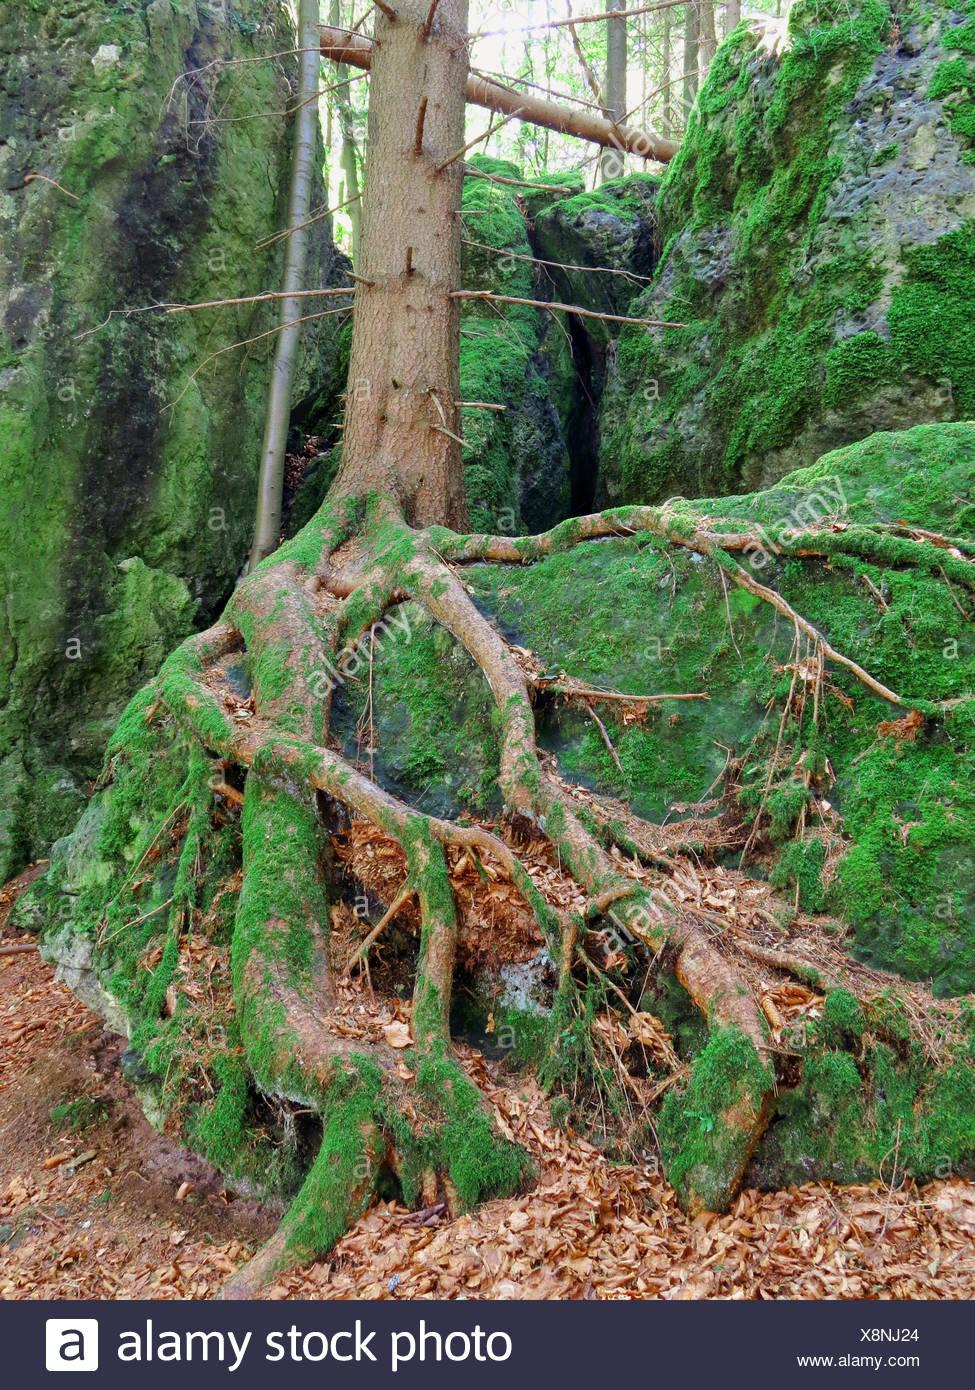 Wood, Forest, roots, rhizome, beech, moss, autumn, detail, tree, foliage - Stock Image